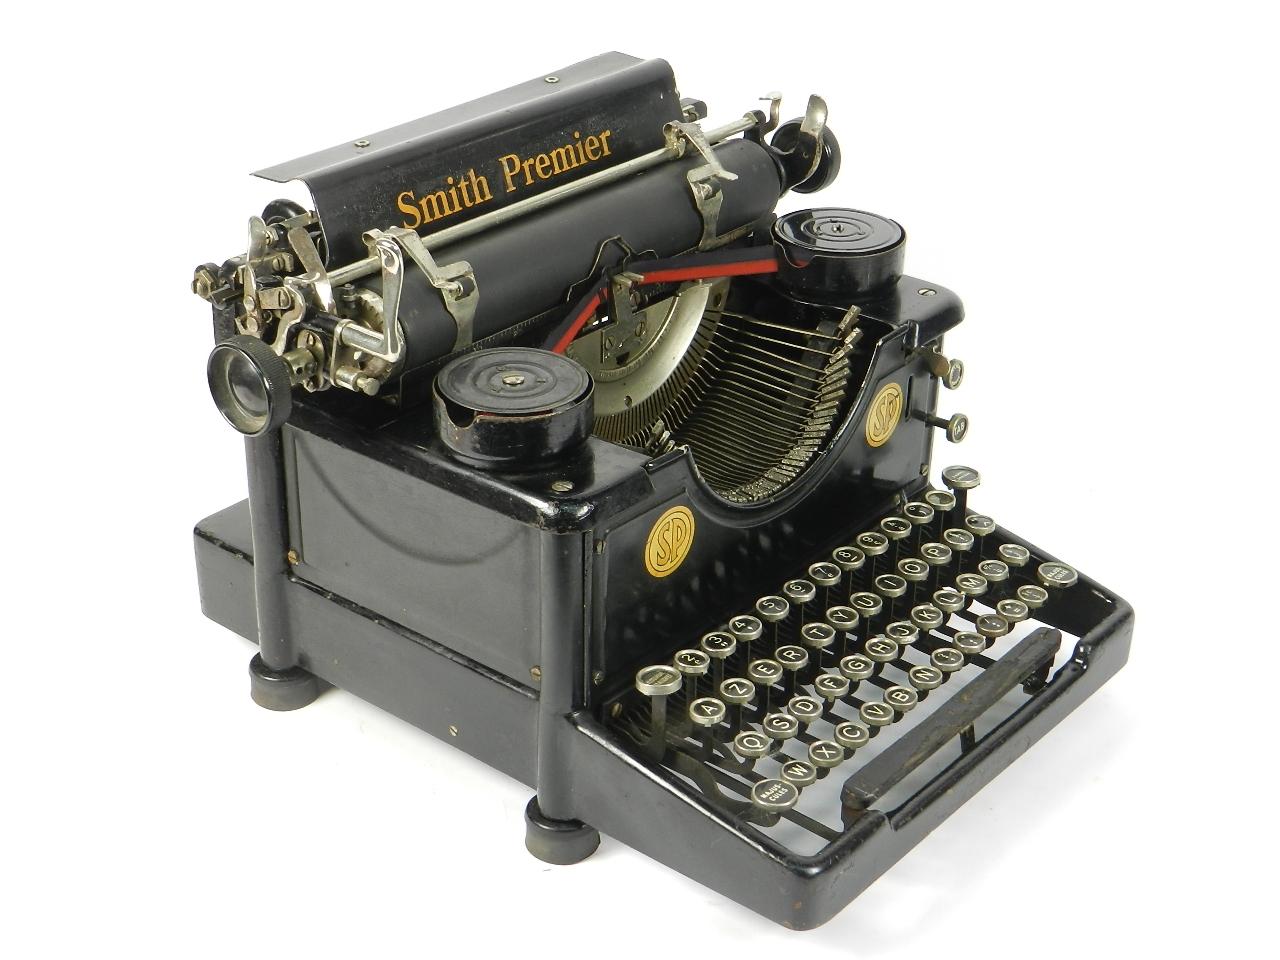 Imagen SMITH PREMIER Mod 50 AÑO 1923 31205